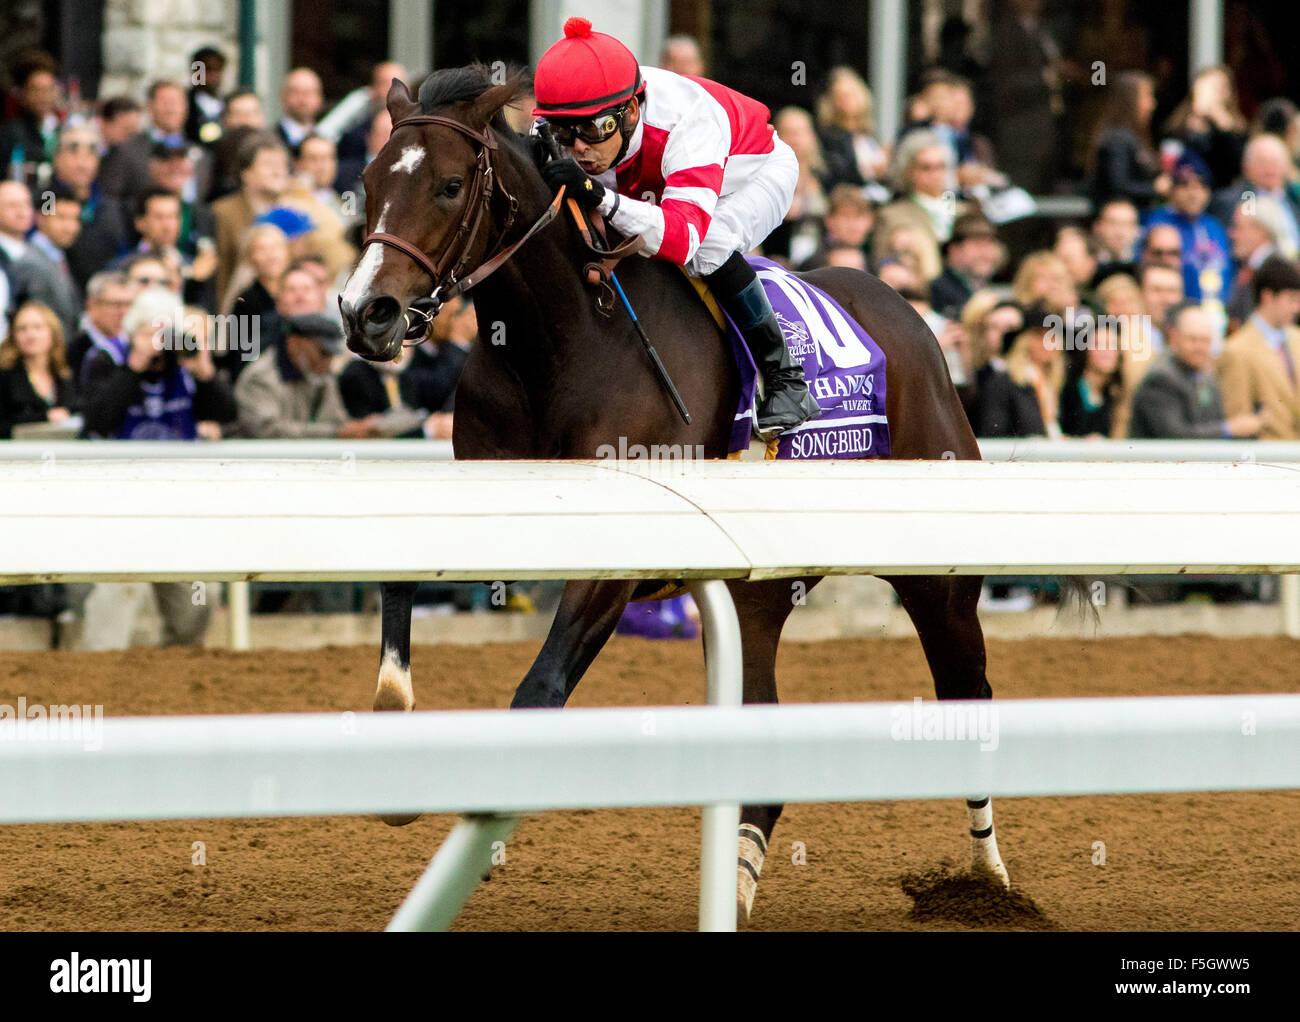 E Chavez Stock Photos & E Chavez Stock Images - Alamy